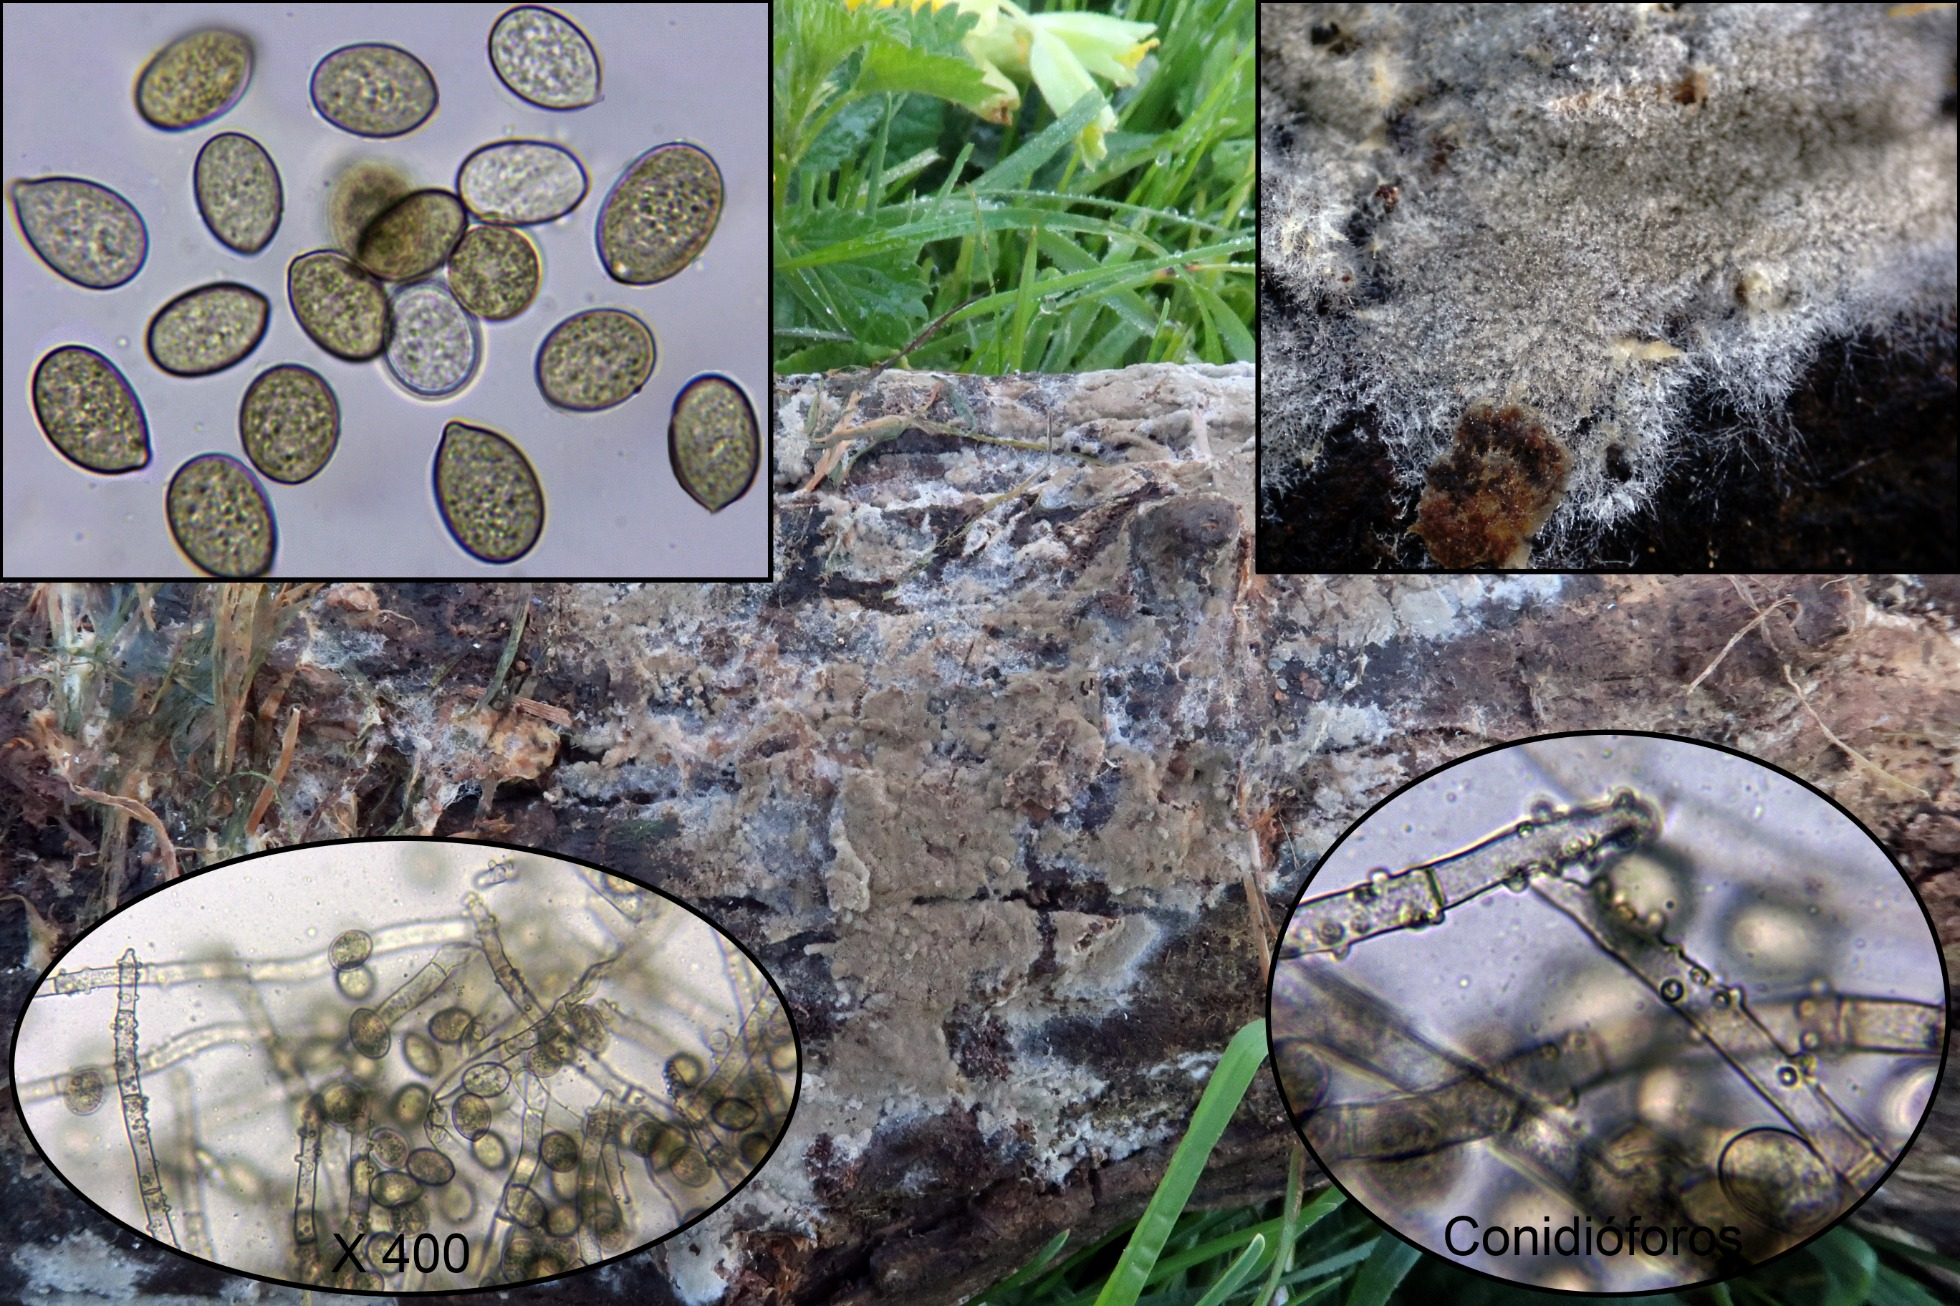 Botryobasidiumconspersump_2020-04-01.jpg